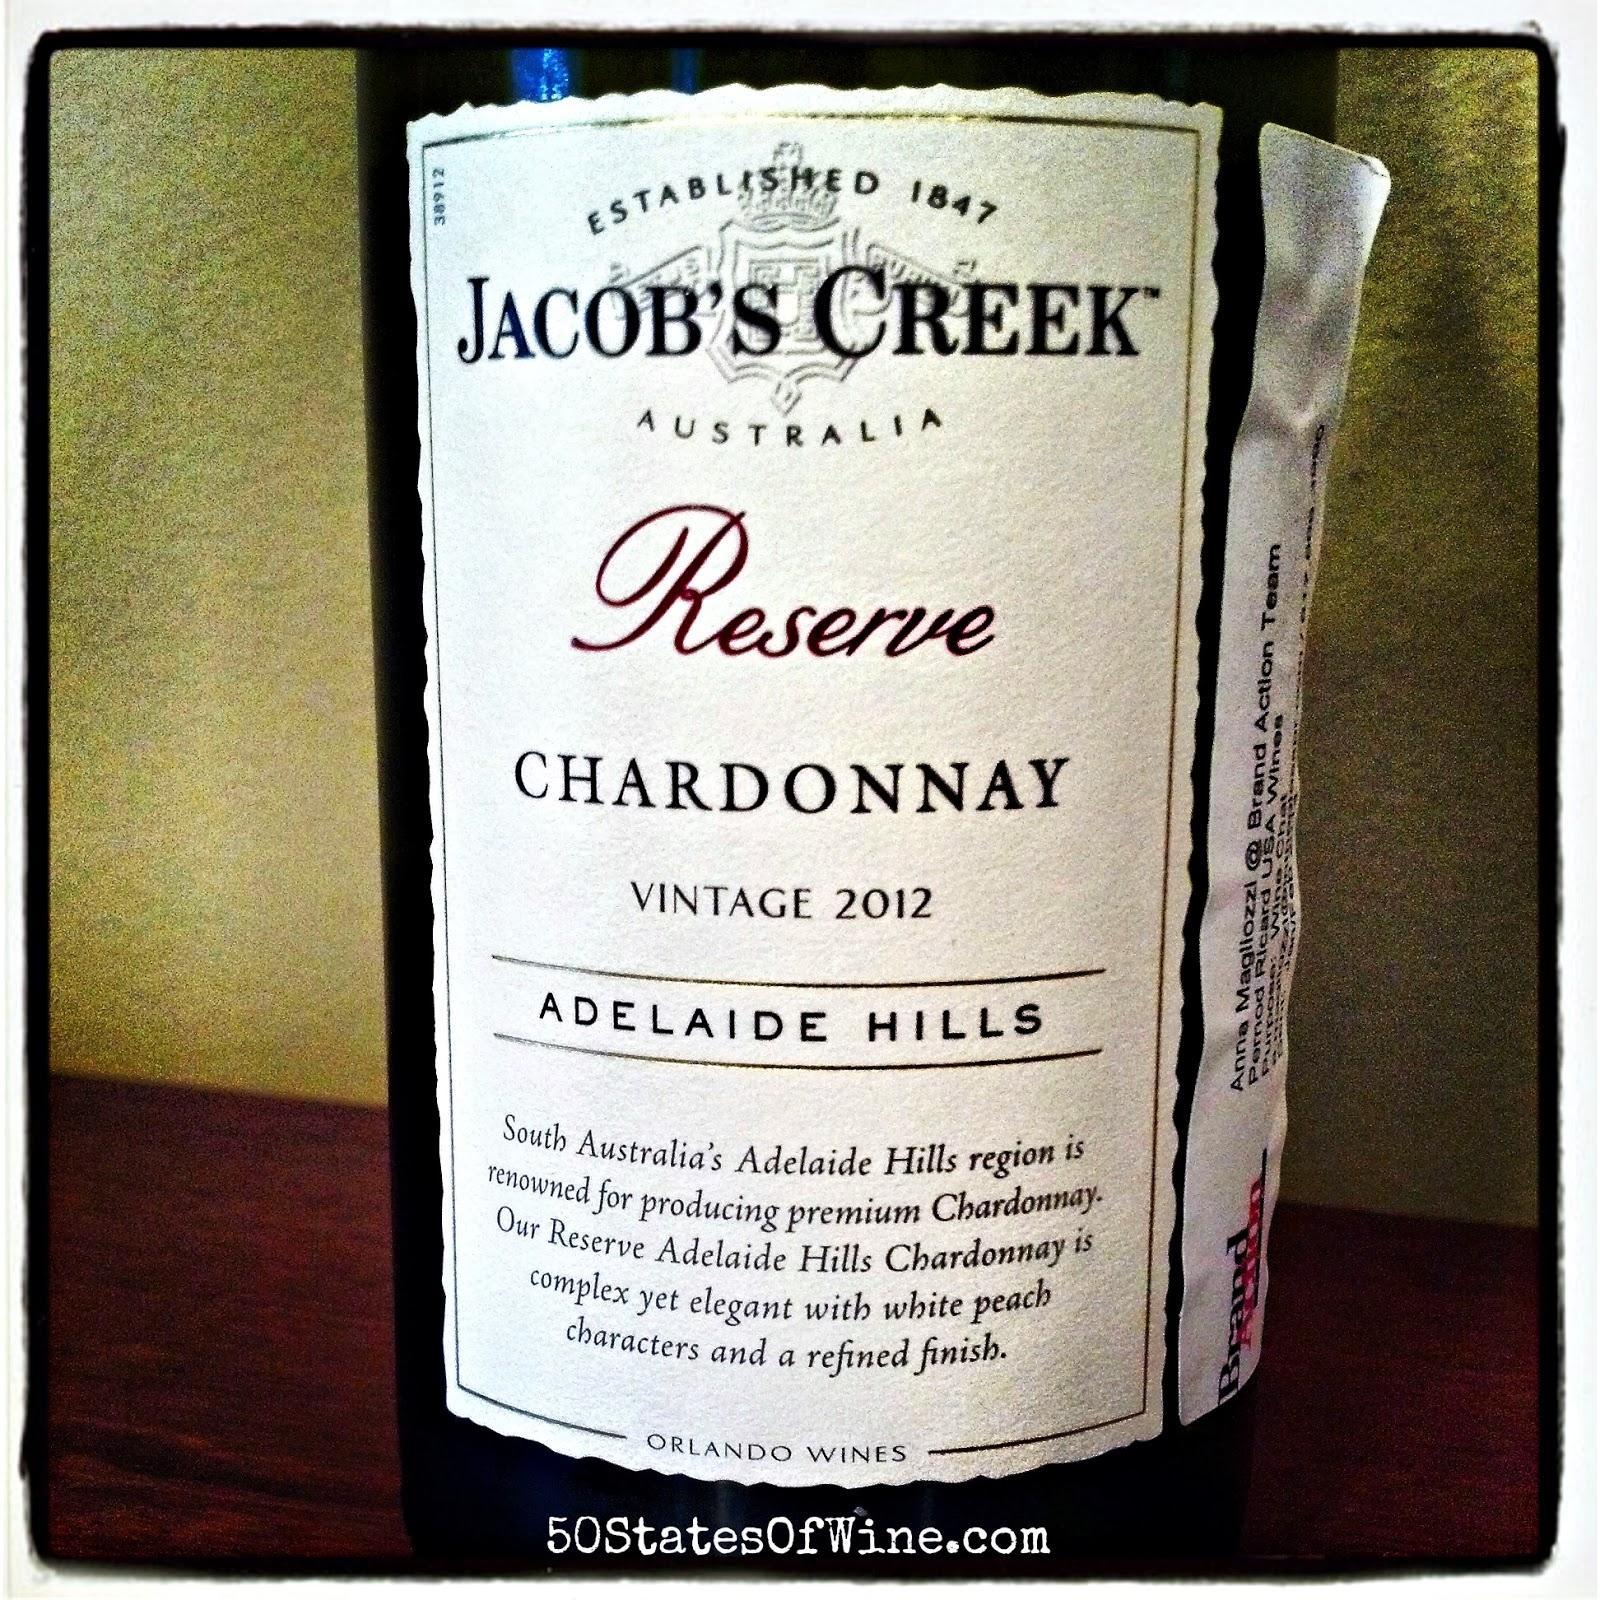 Jacob's Creek Reserve Adelaide Hills Chardonnay 2012